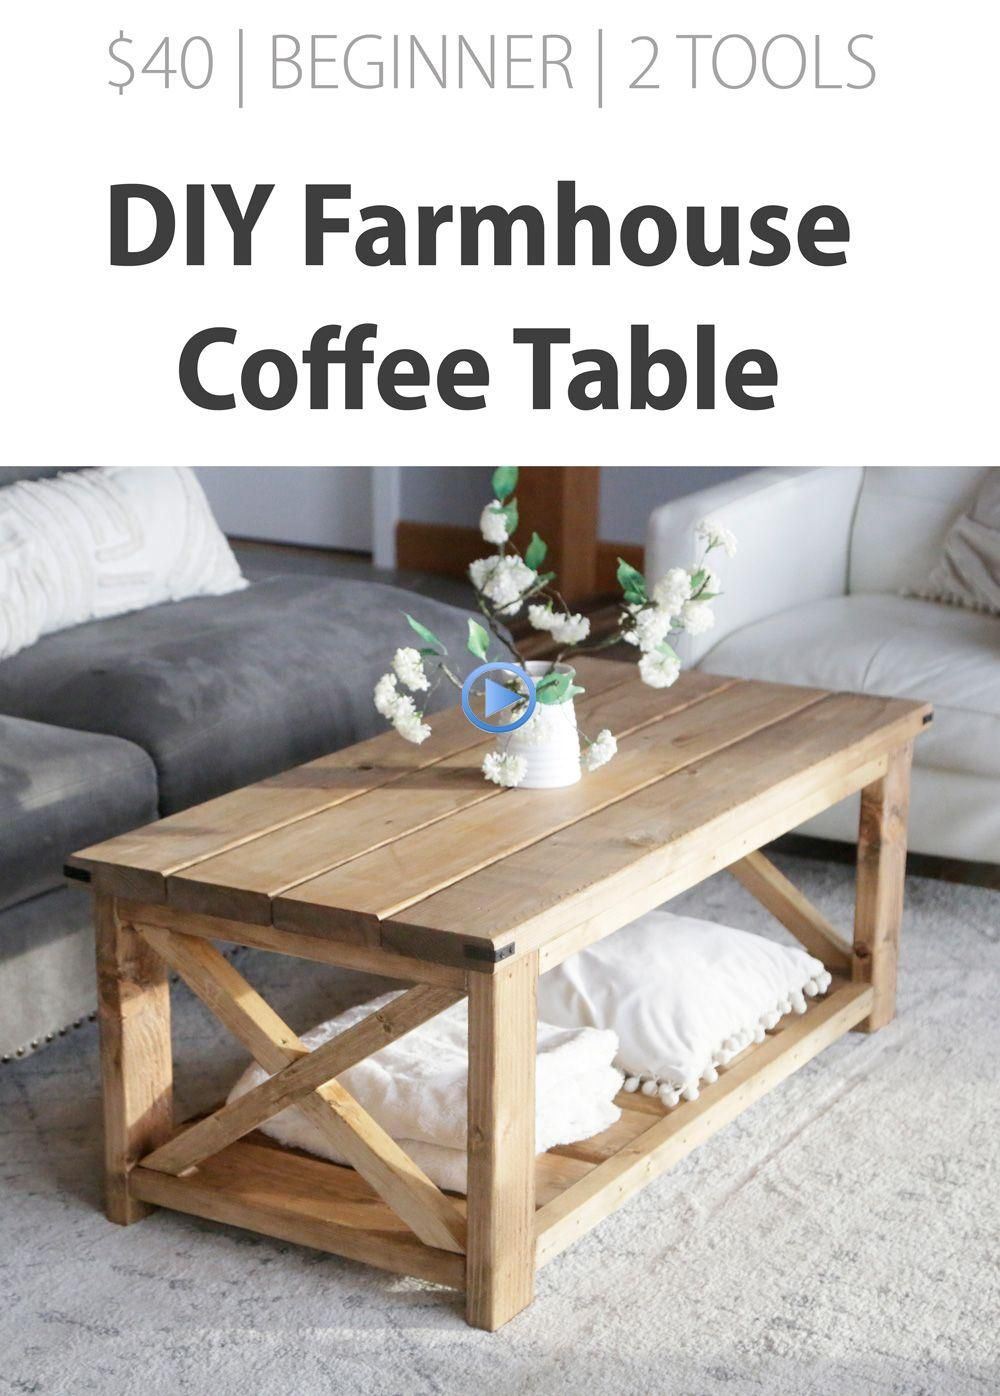 Farmhouse Coffee Table Ana White diyfurniture in 2020